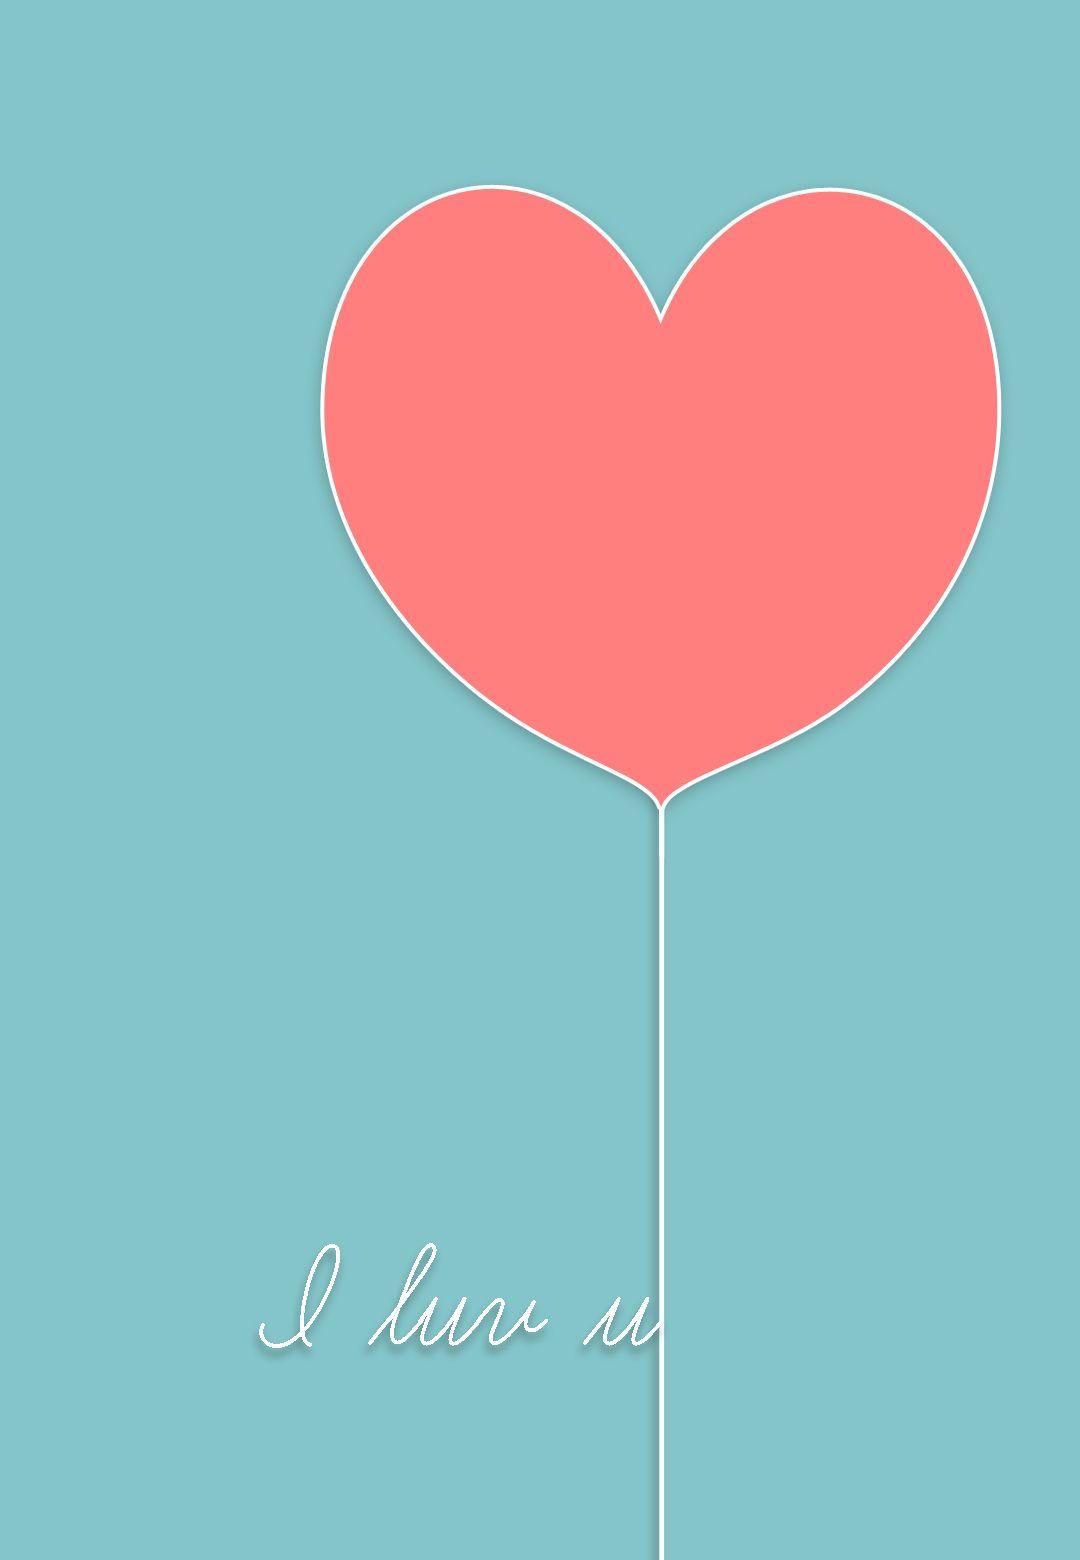 Love card free printable httpgreetingsisland love card free printable httpgreetingsisland kristyandbryce Images